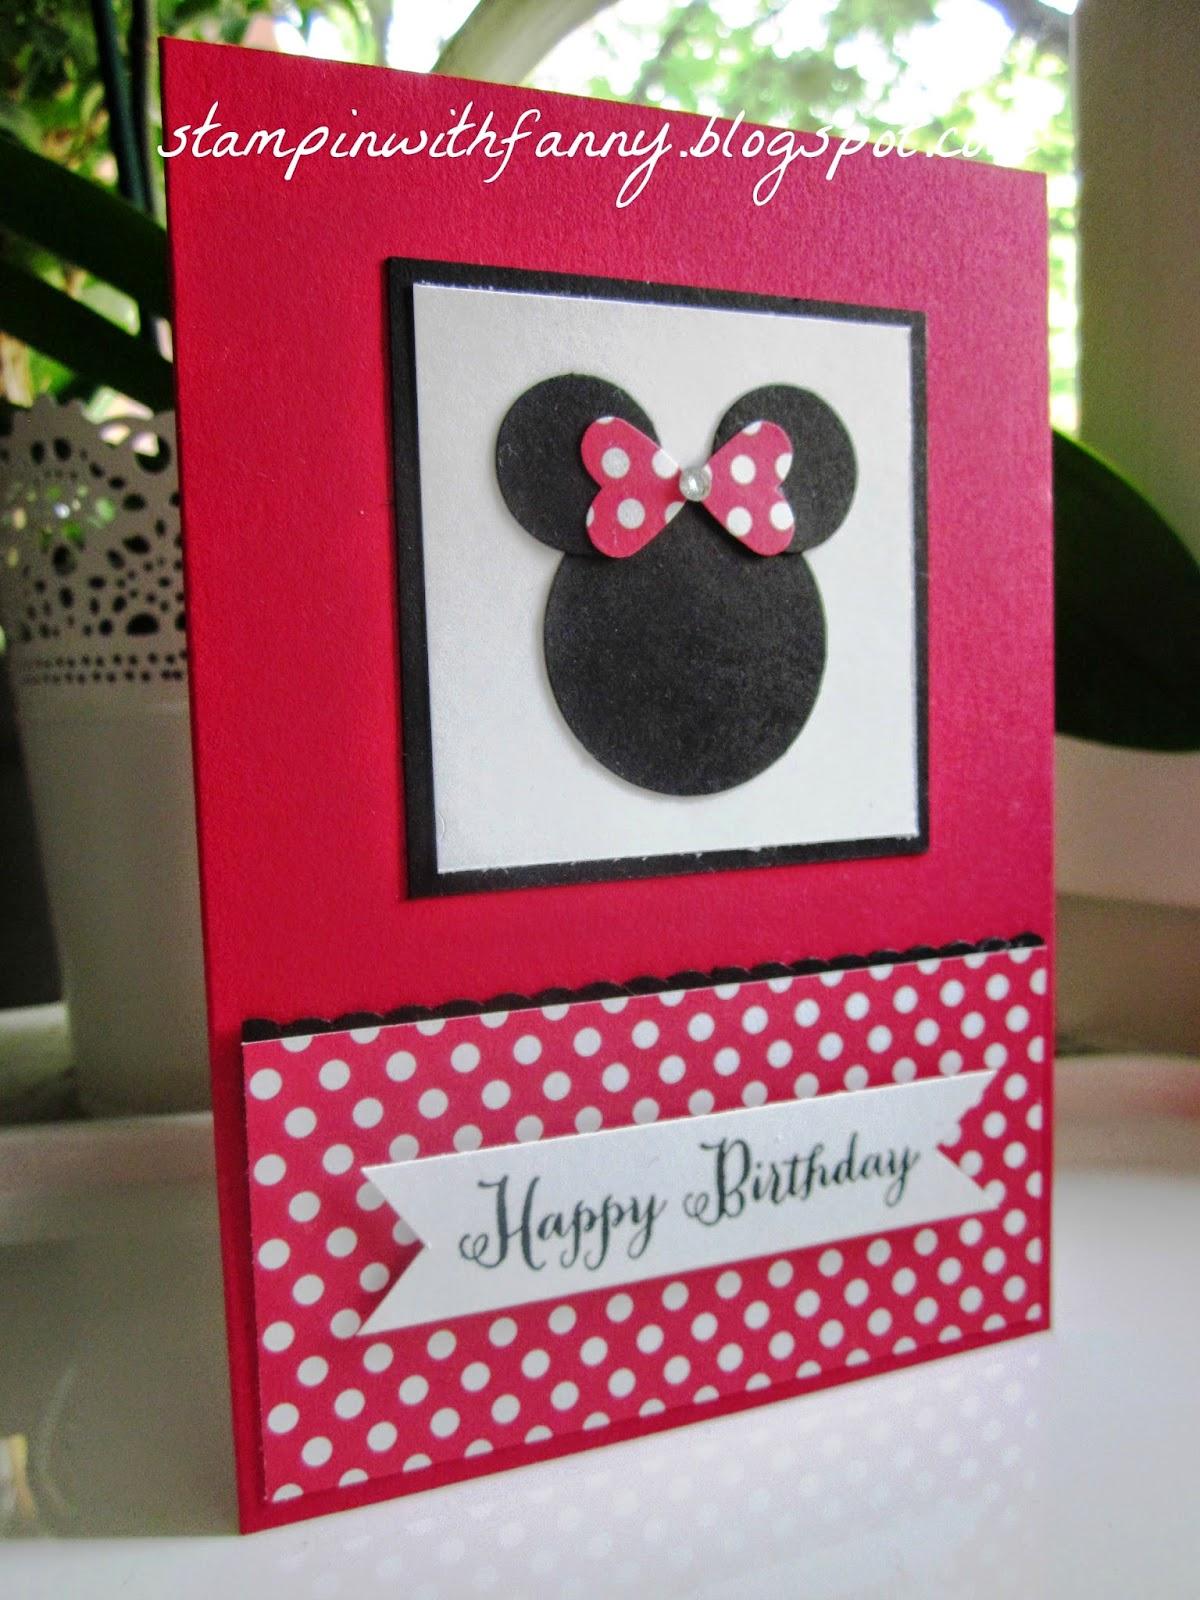 stampin with fanny: Happy Birthday mit Minnie Maus